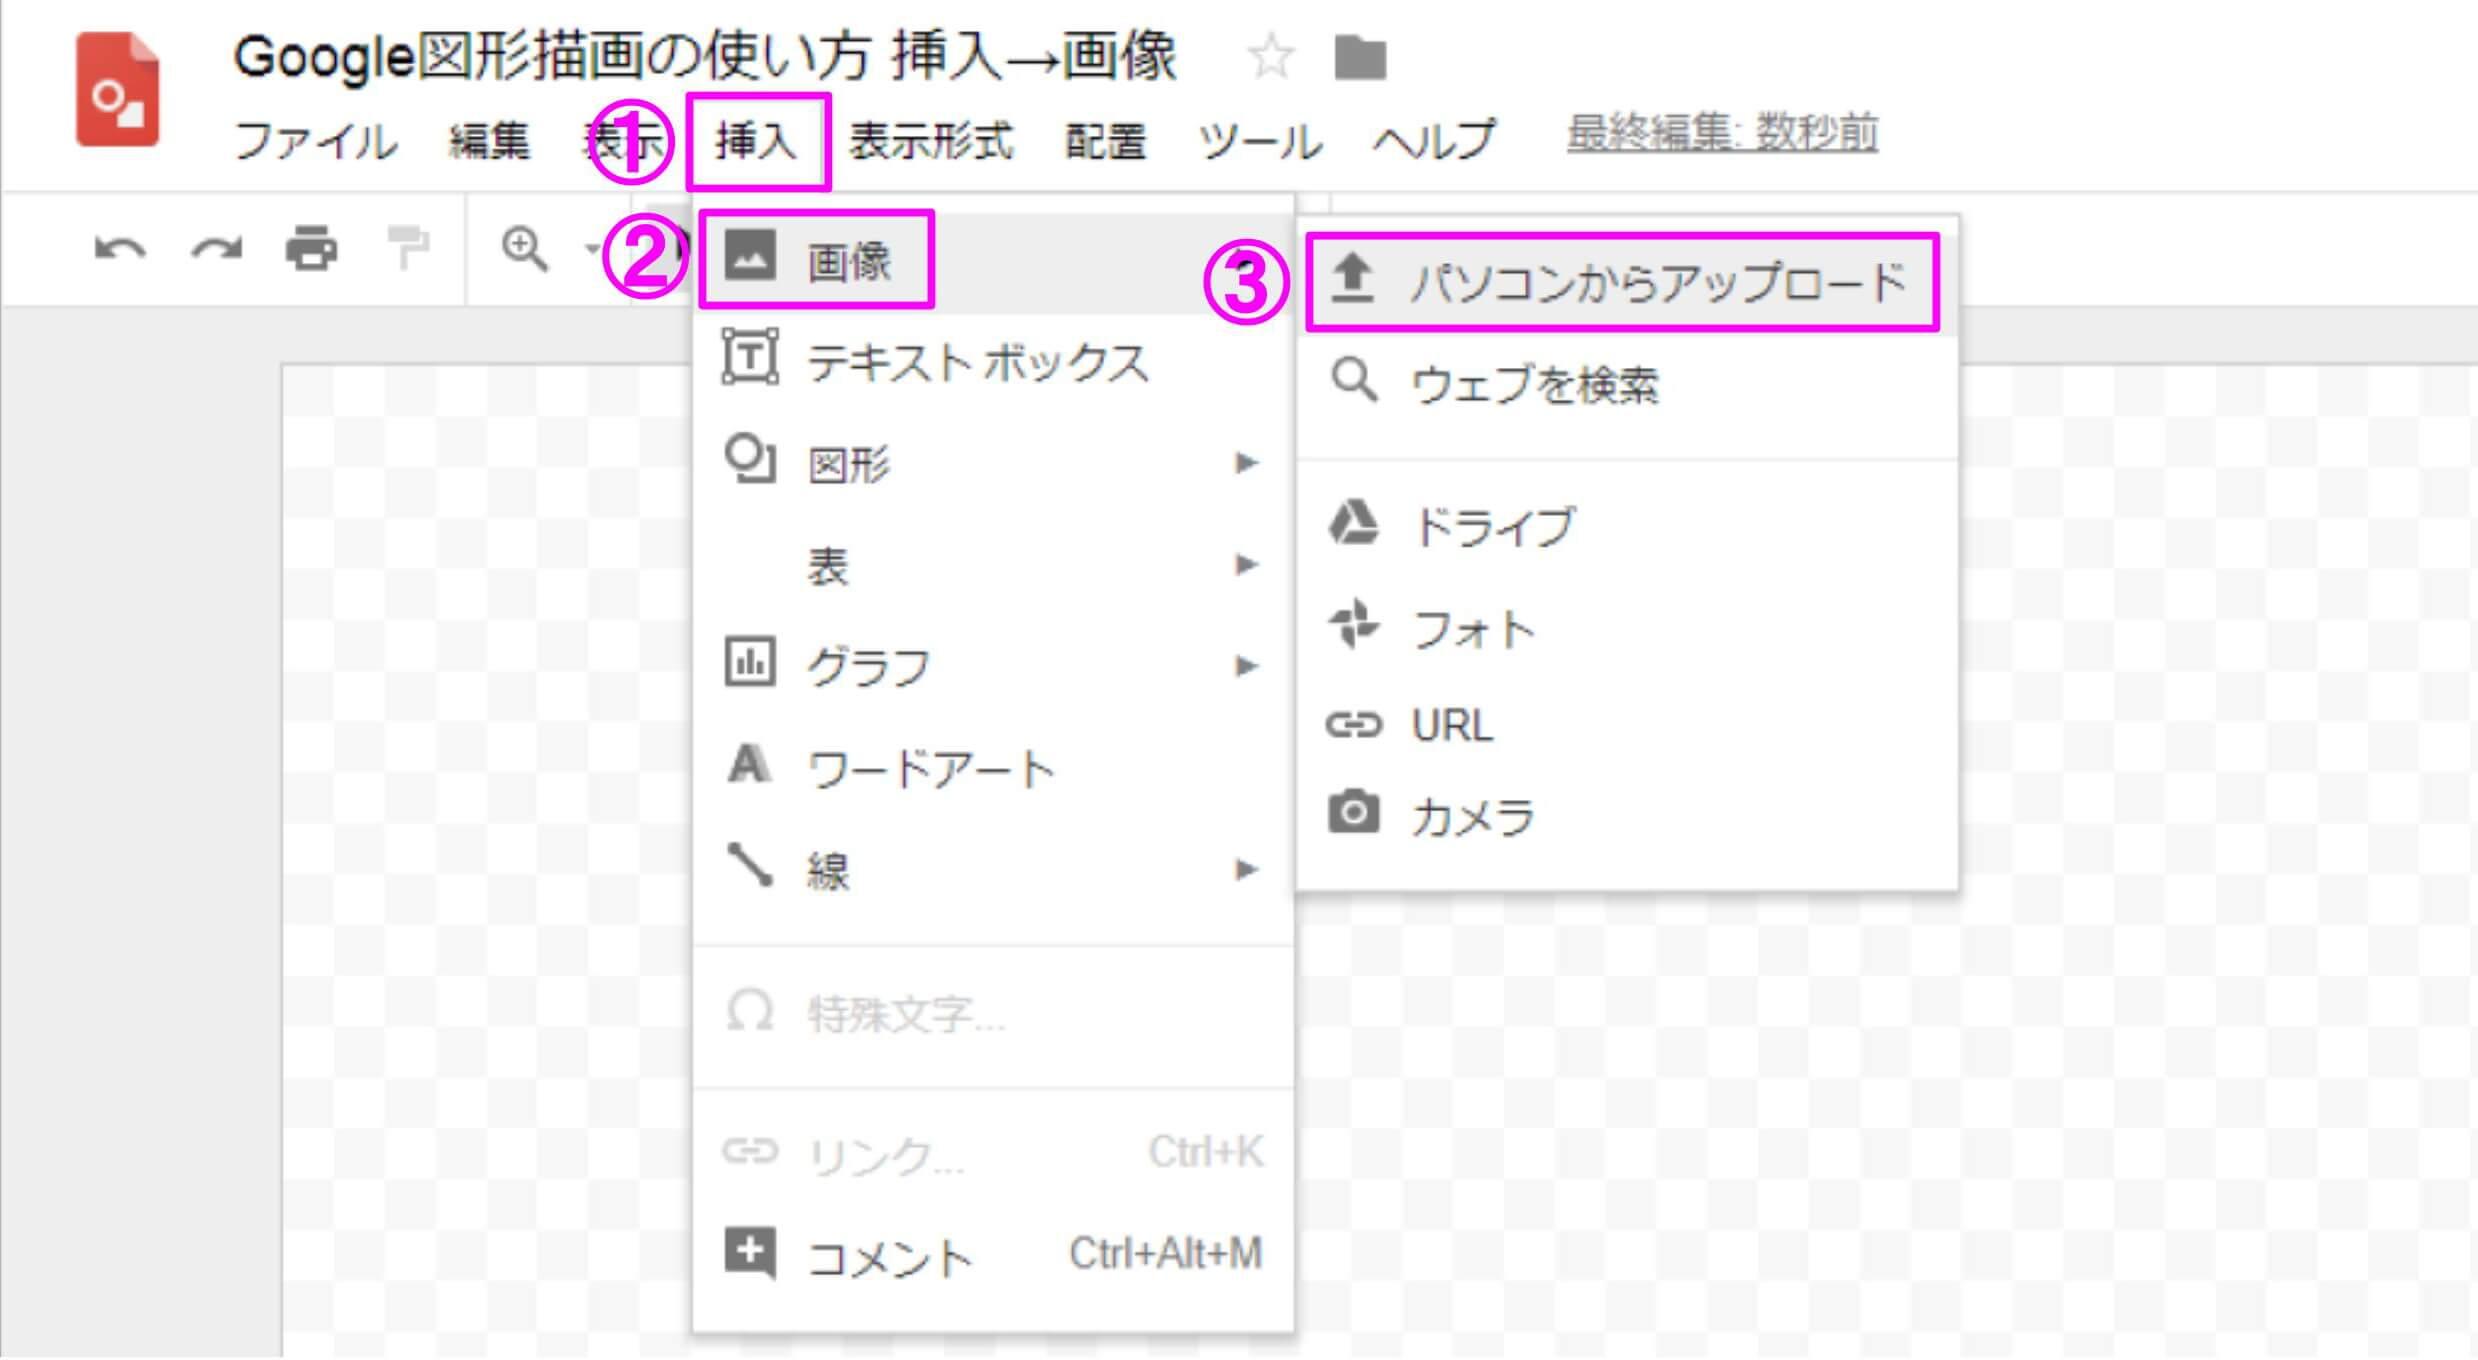 Google図形描画の使い方 挿入→画像